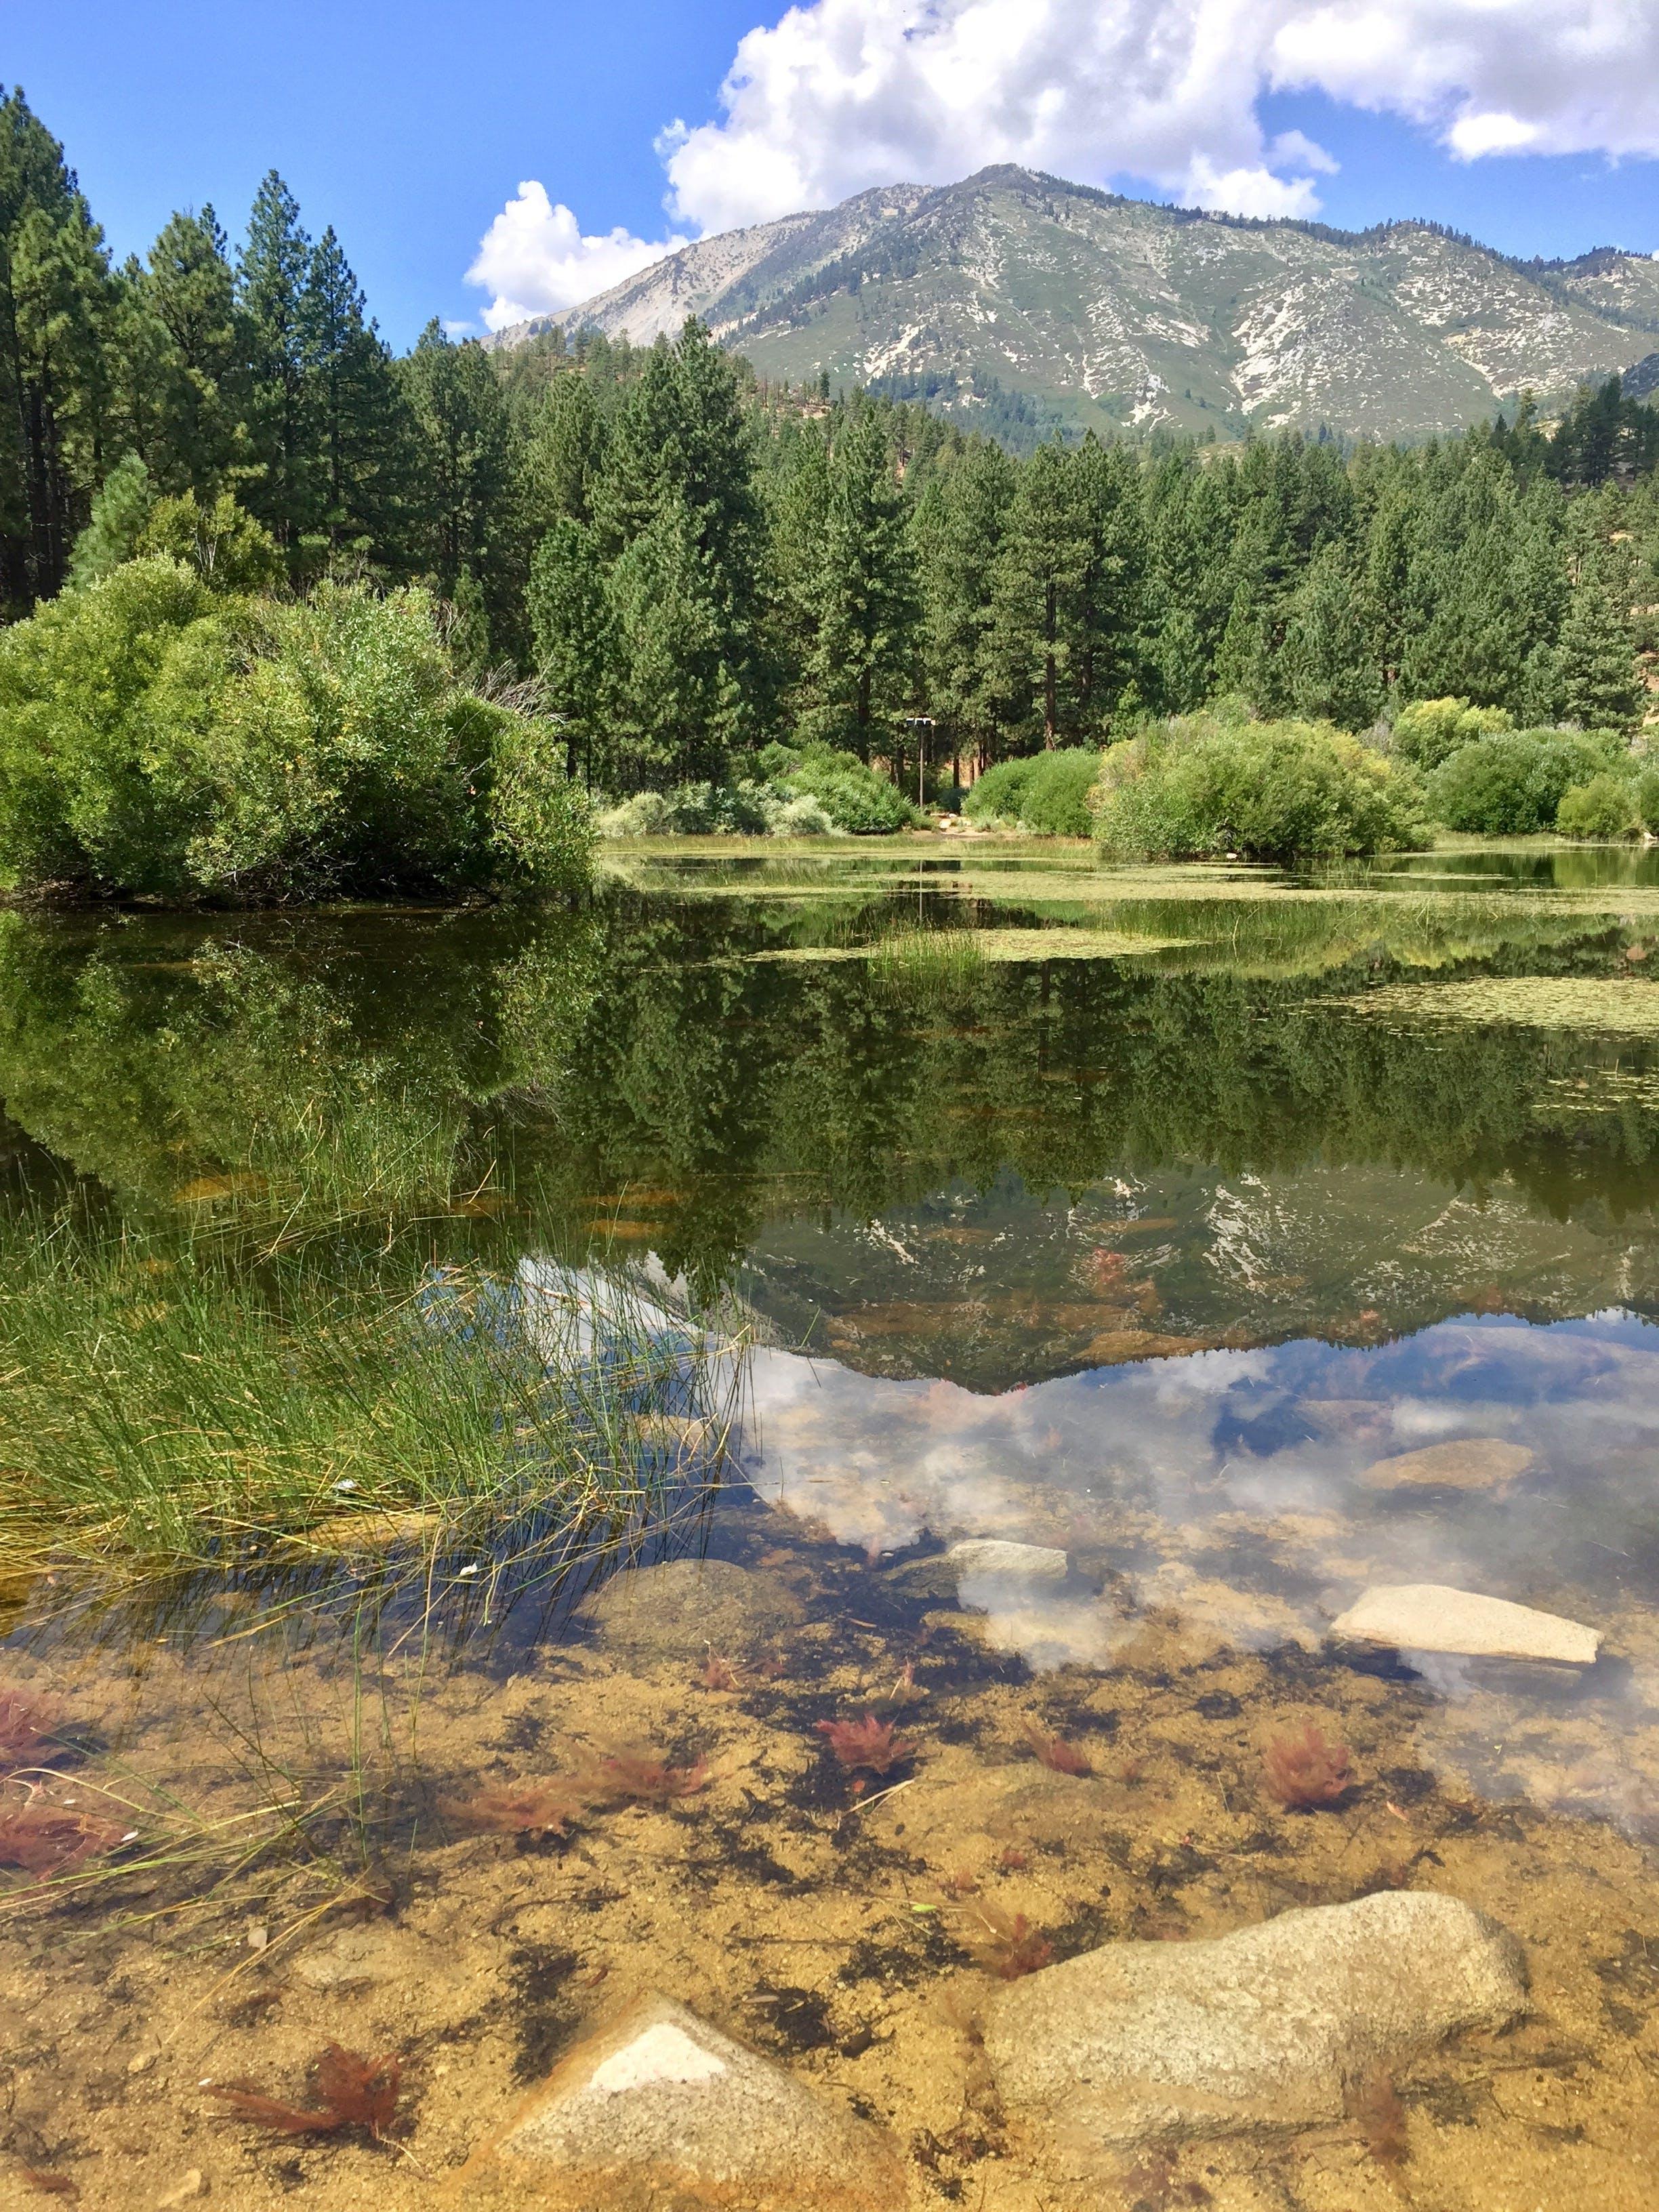 Davis Creek, Sierra Nevada mountains